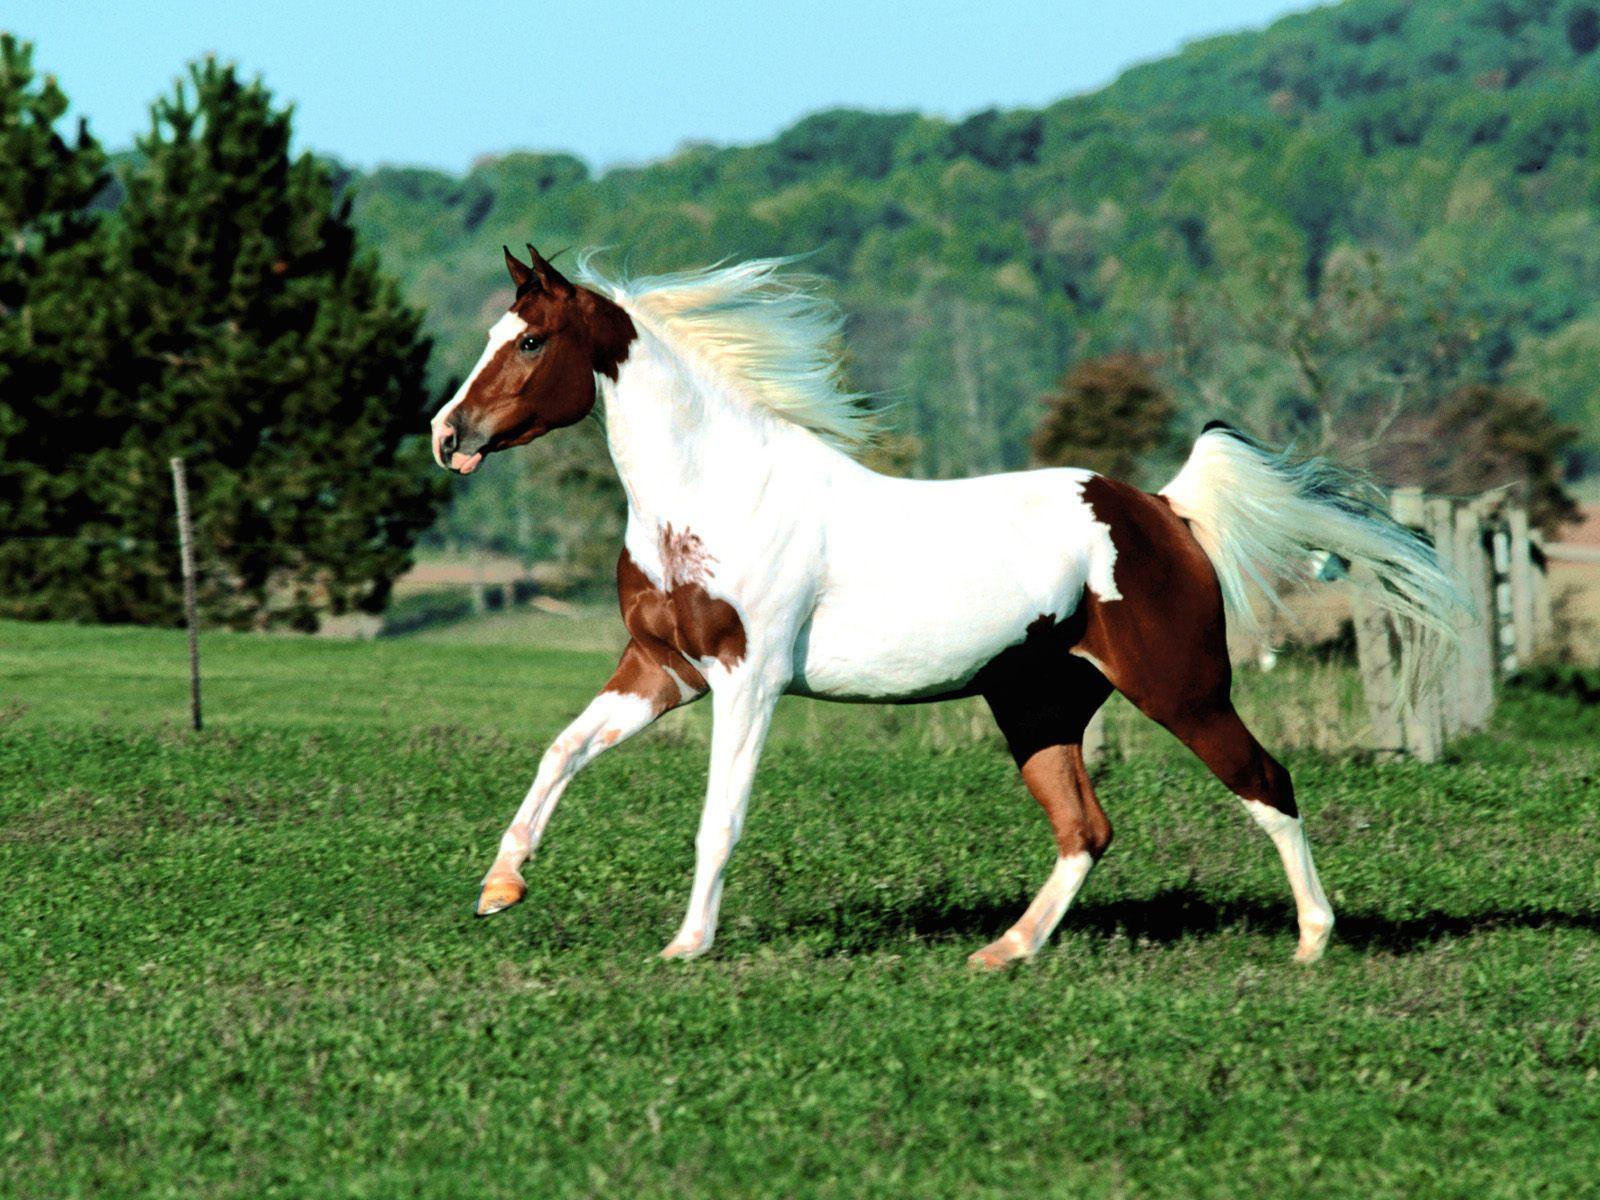 Ver fotos de caballos de mar 63